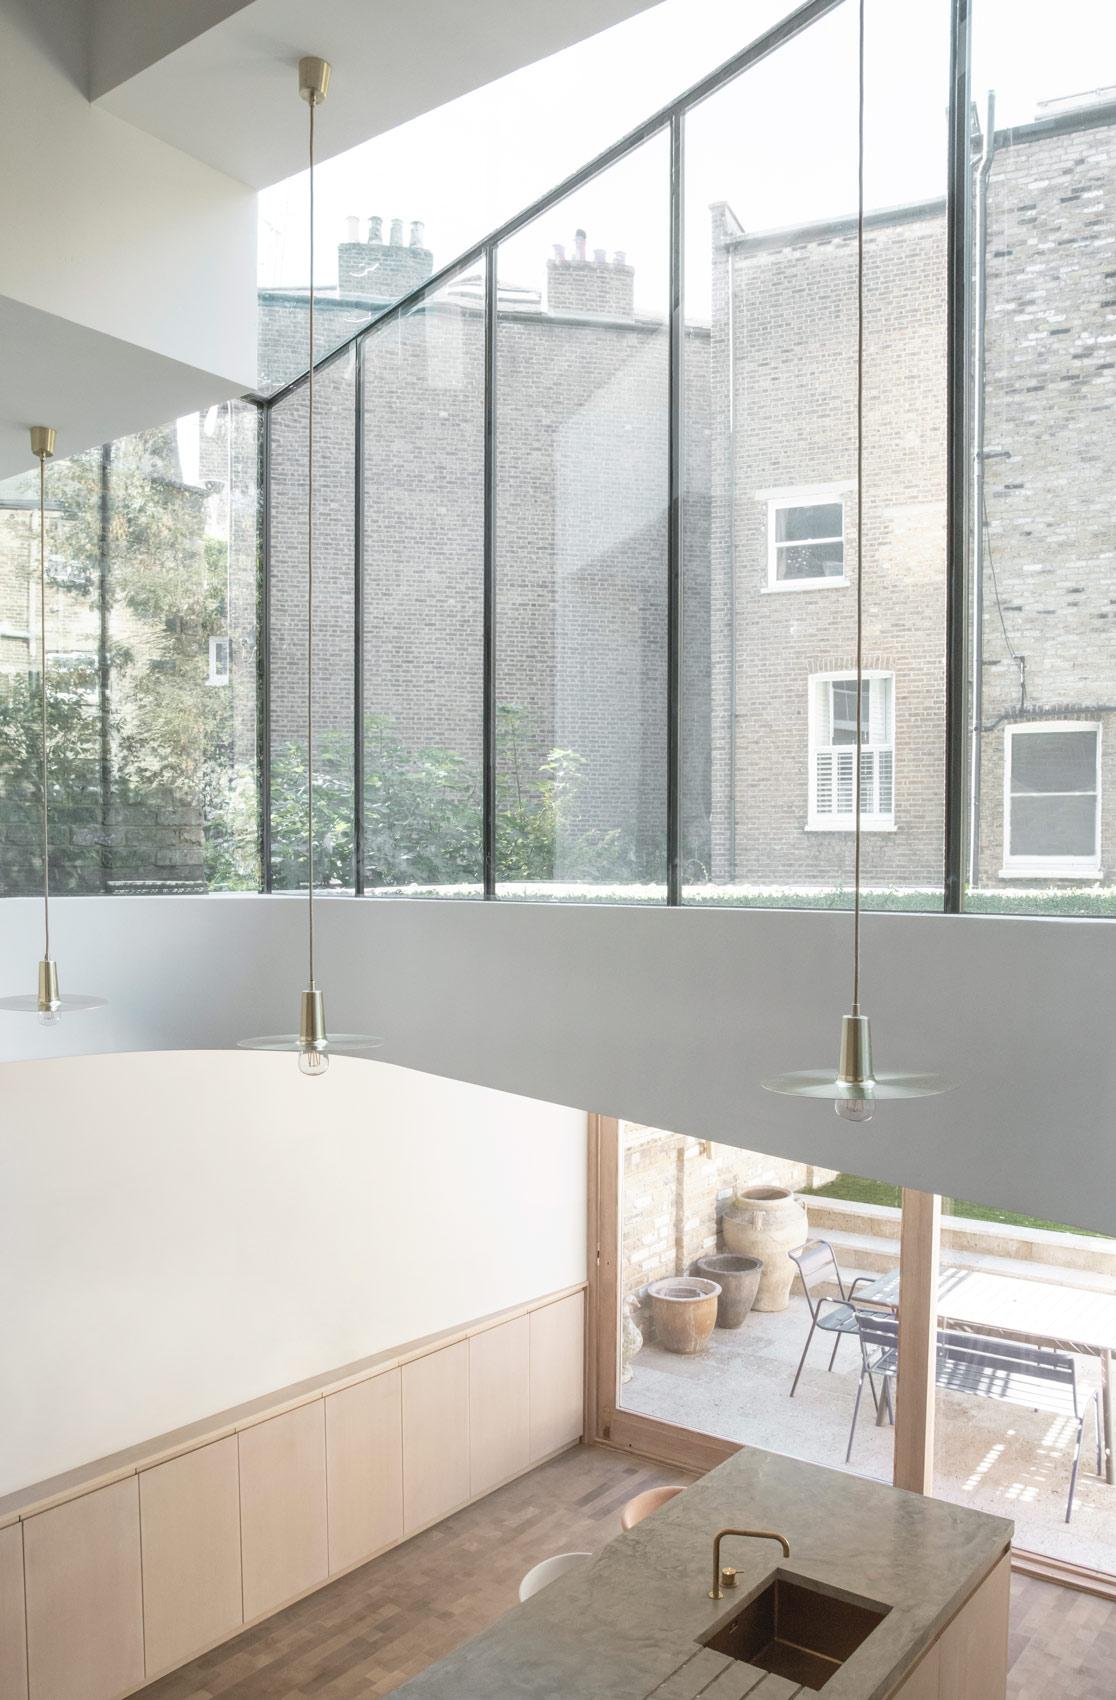 London house extension ideas glass